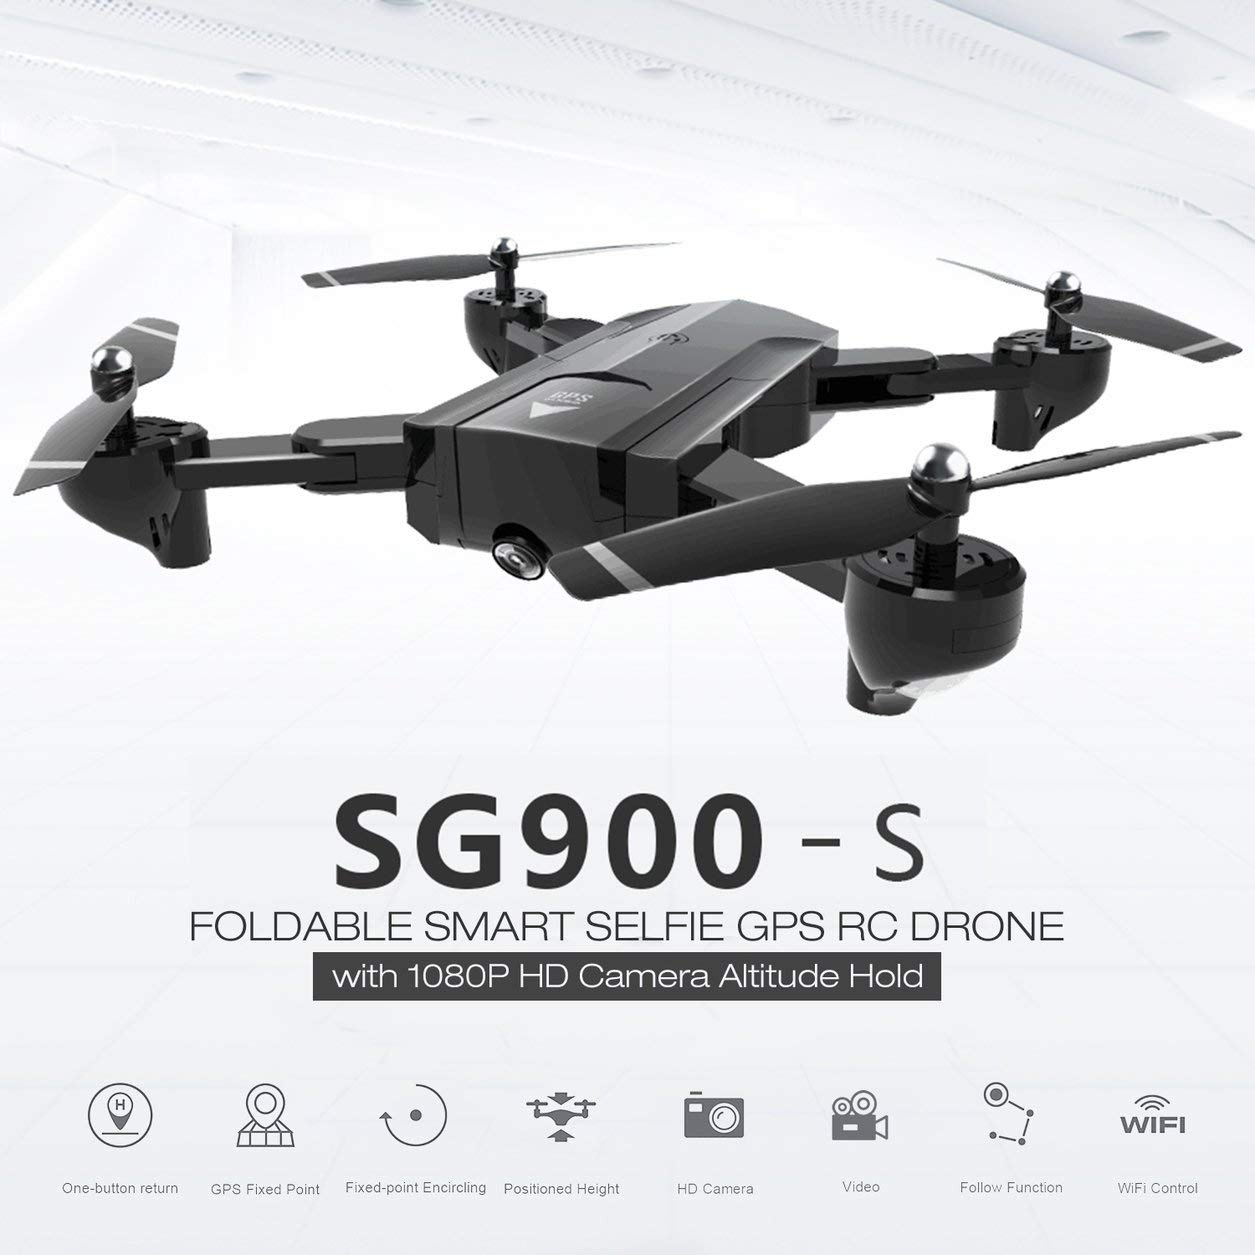 Dailyinshop SG900-S 2,4G RC Drohne Faltbare Selfie Smart GPS FPV Quadcopter mit 1080 P HD Kamera Höhe Halten Follow Me One Key Return (Farbe: Schwarz)